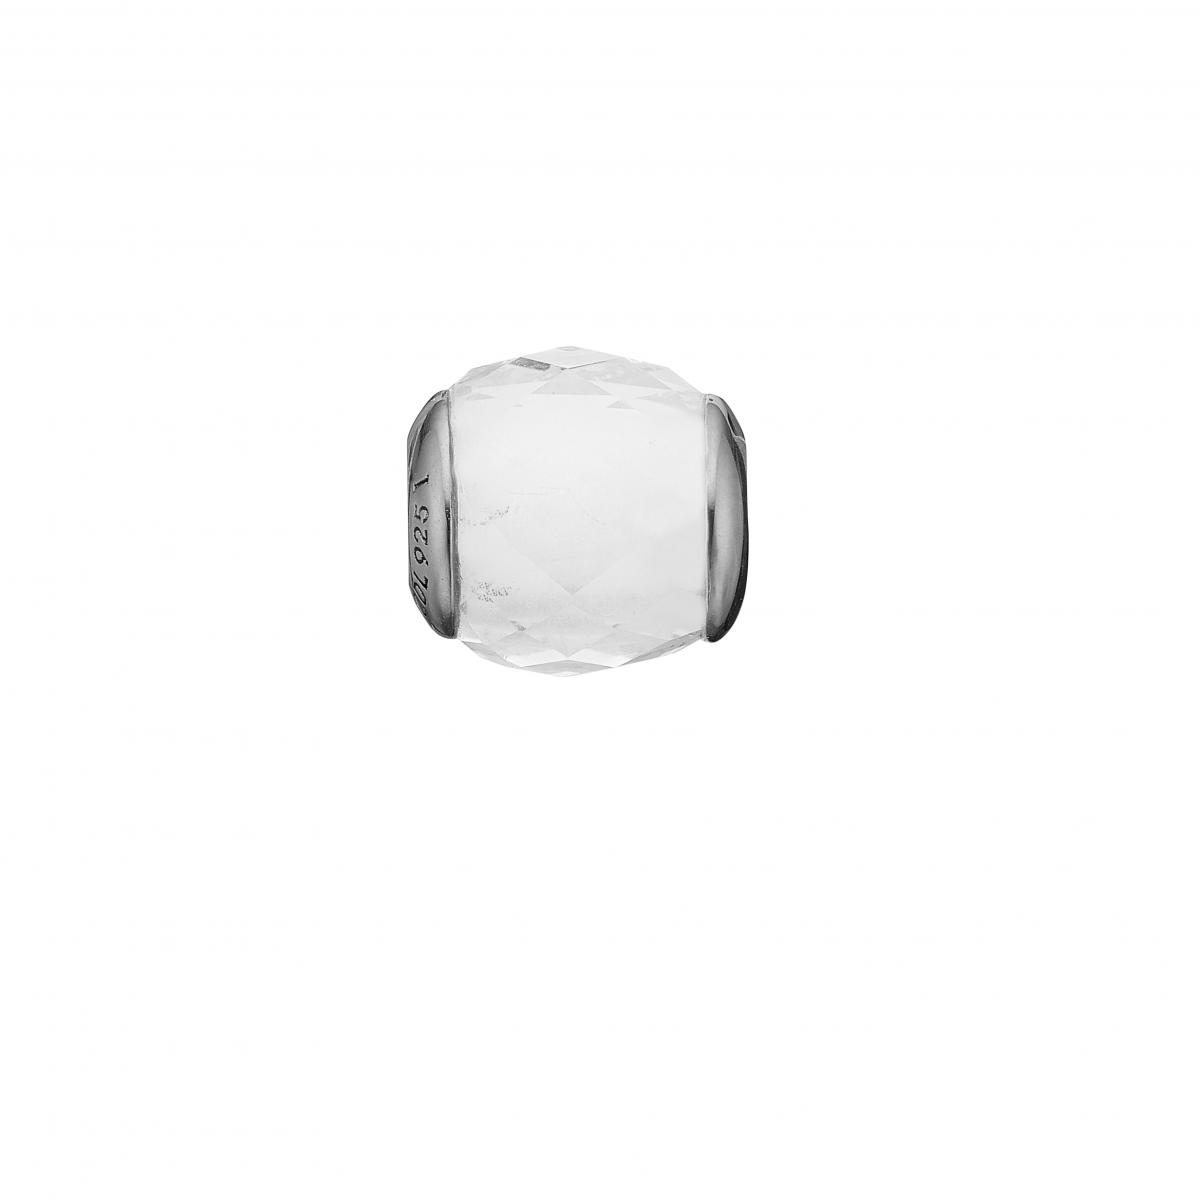 CHRISTINA, Precious Crystal - 623-S38